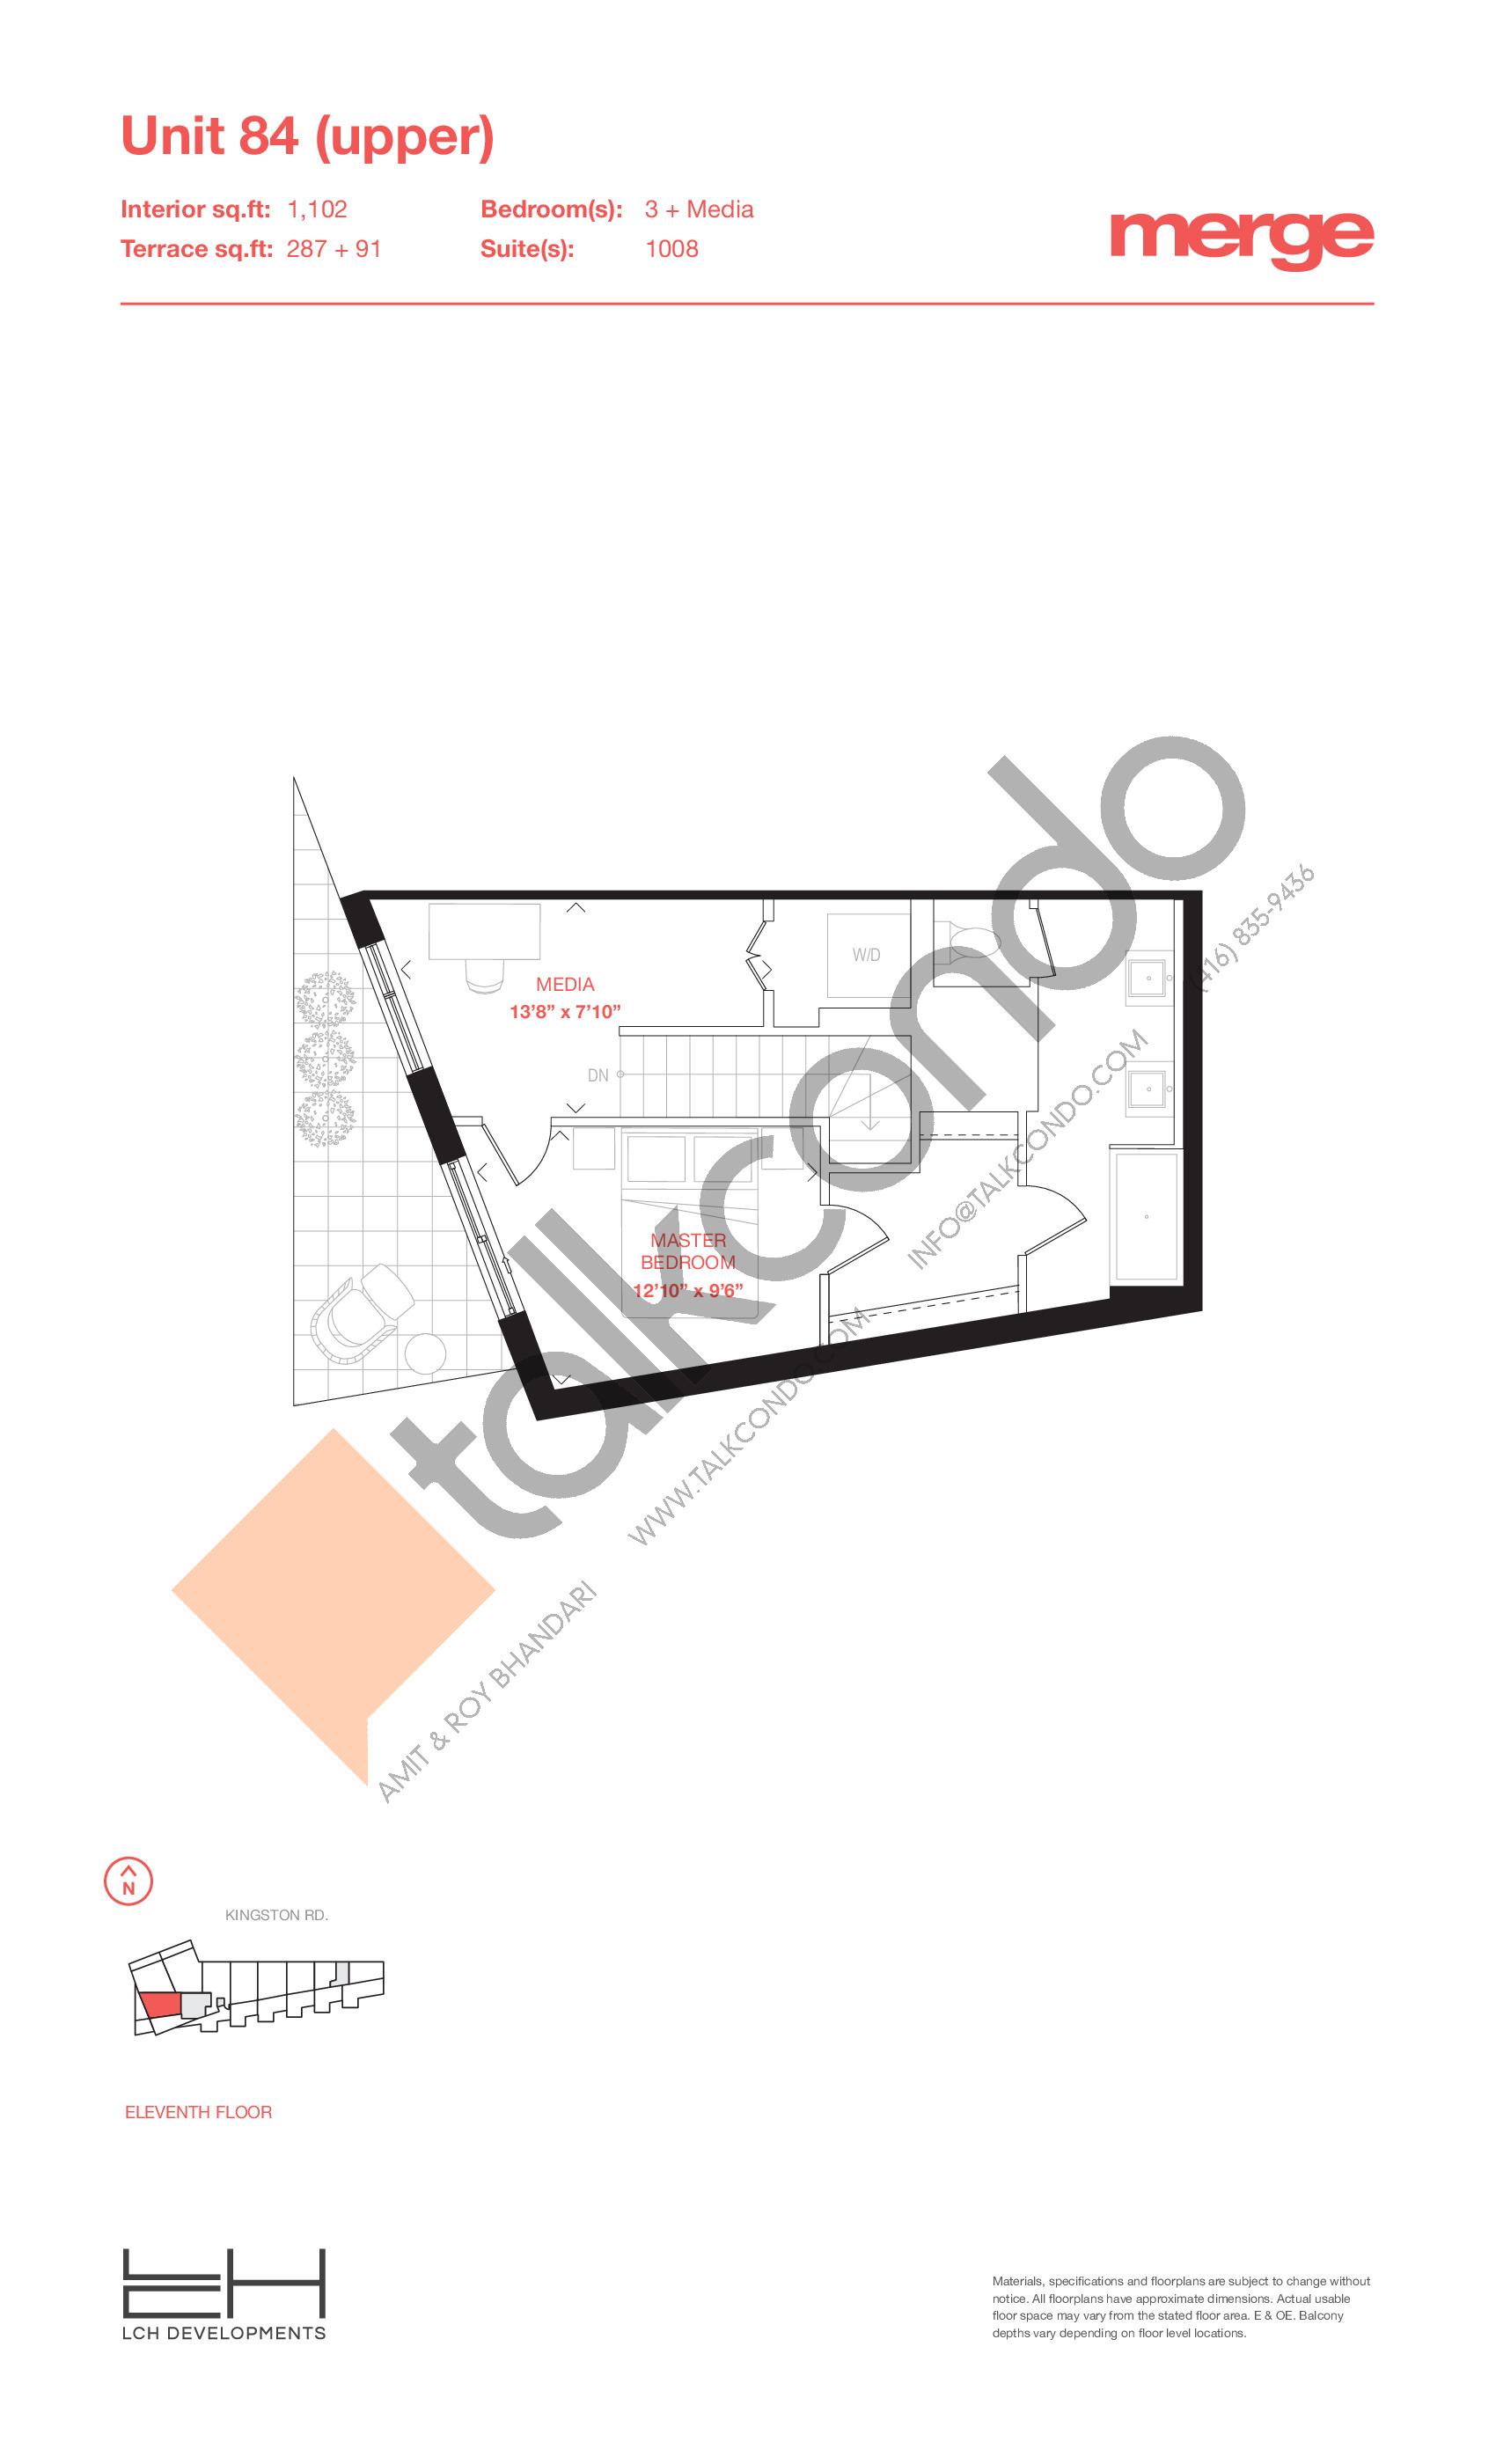 Unit 84 (Upper) - 2 Storey Floor Plan at Merge Condos - 1102 sq.ft